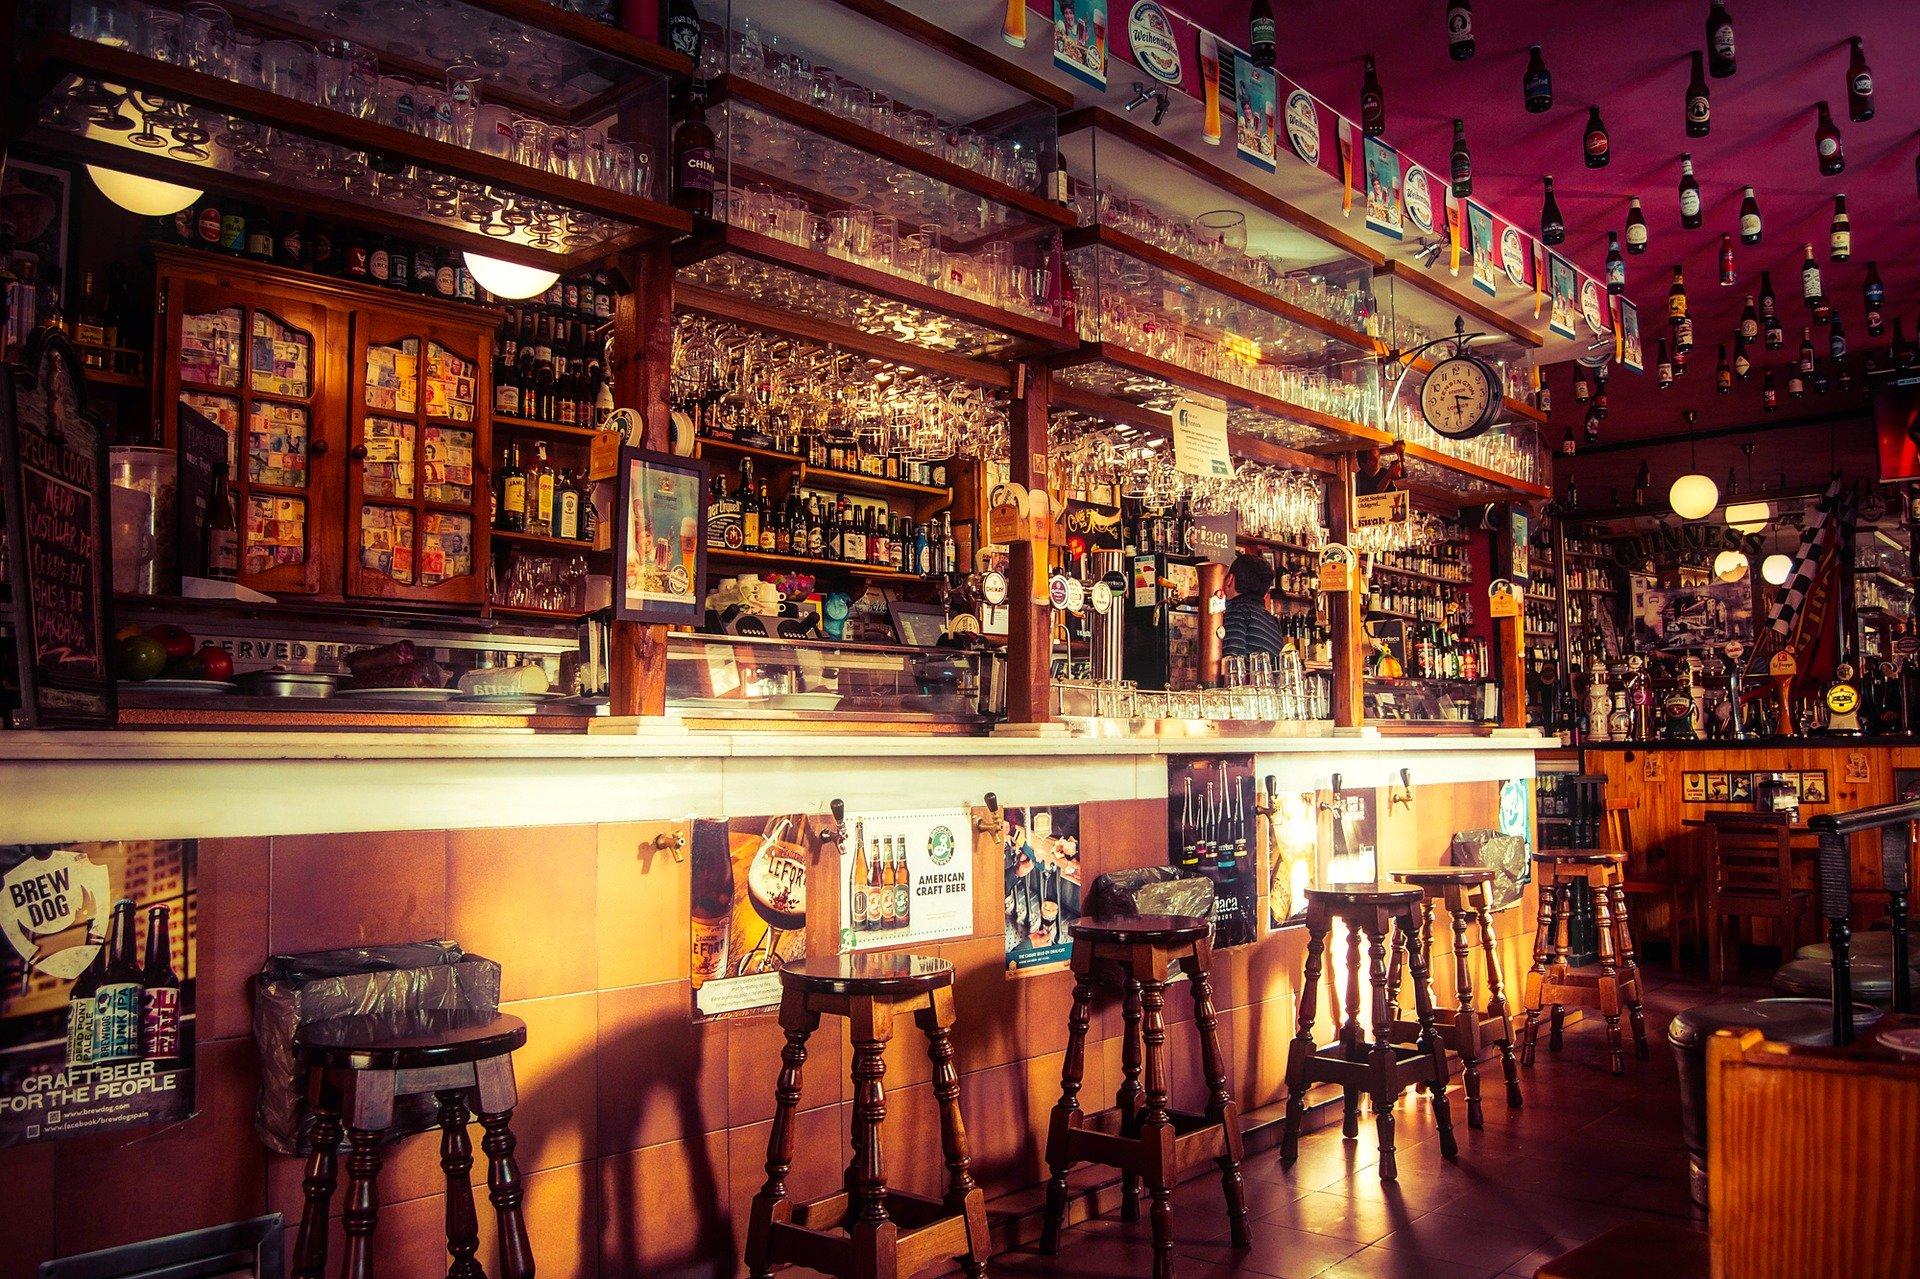 Festive Season Grants for England's Tier 2 & 3 Wet-led Pubs